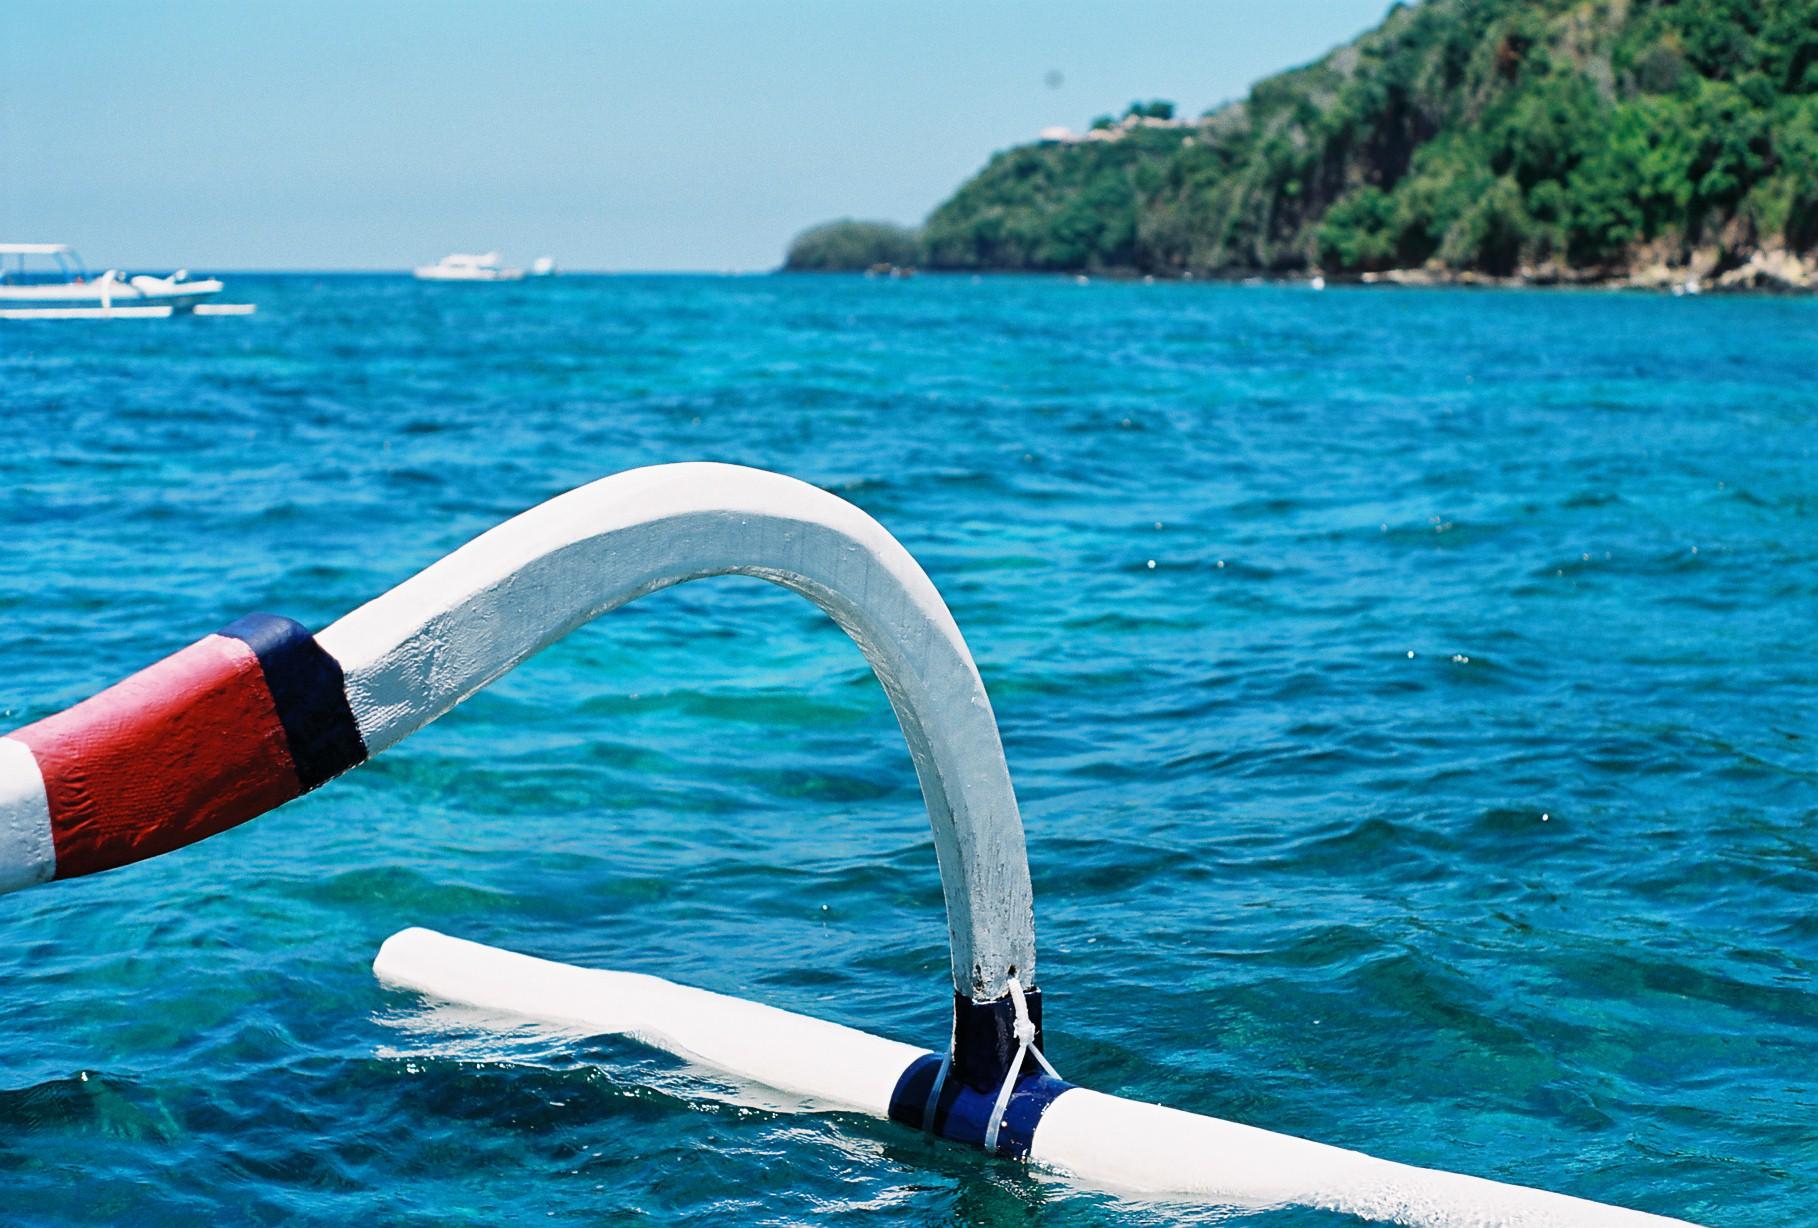 Padangbai Bali Wooden Boat Analogue Travel Photography